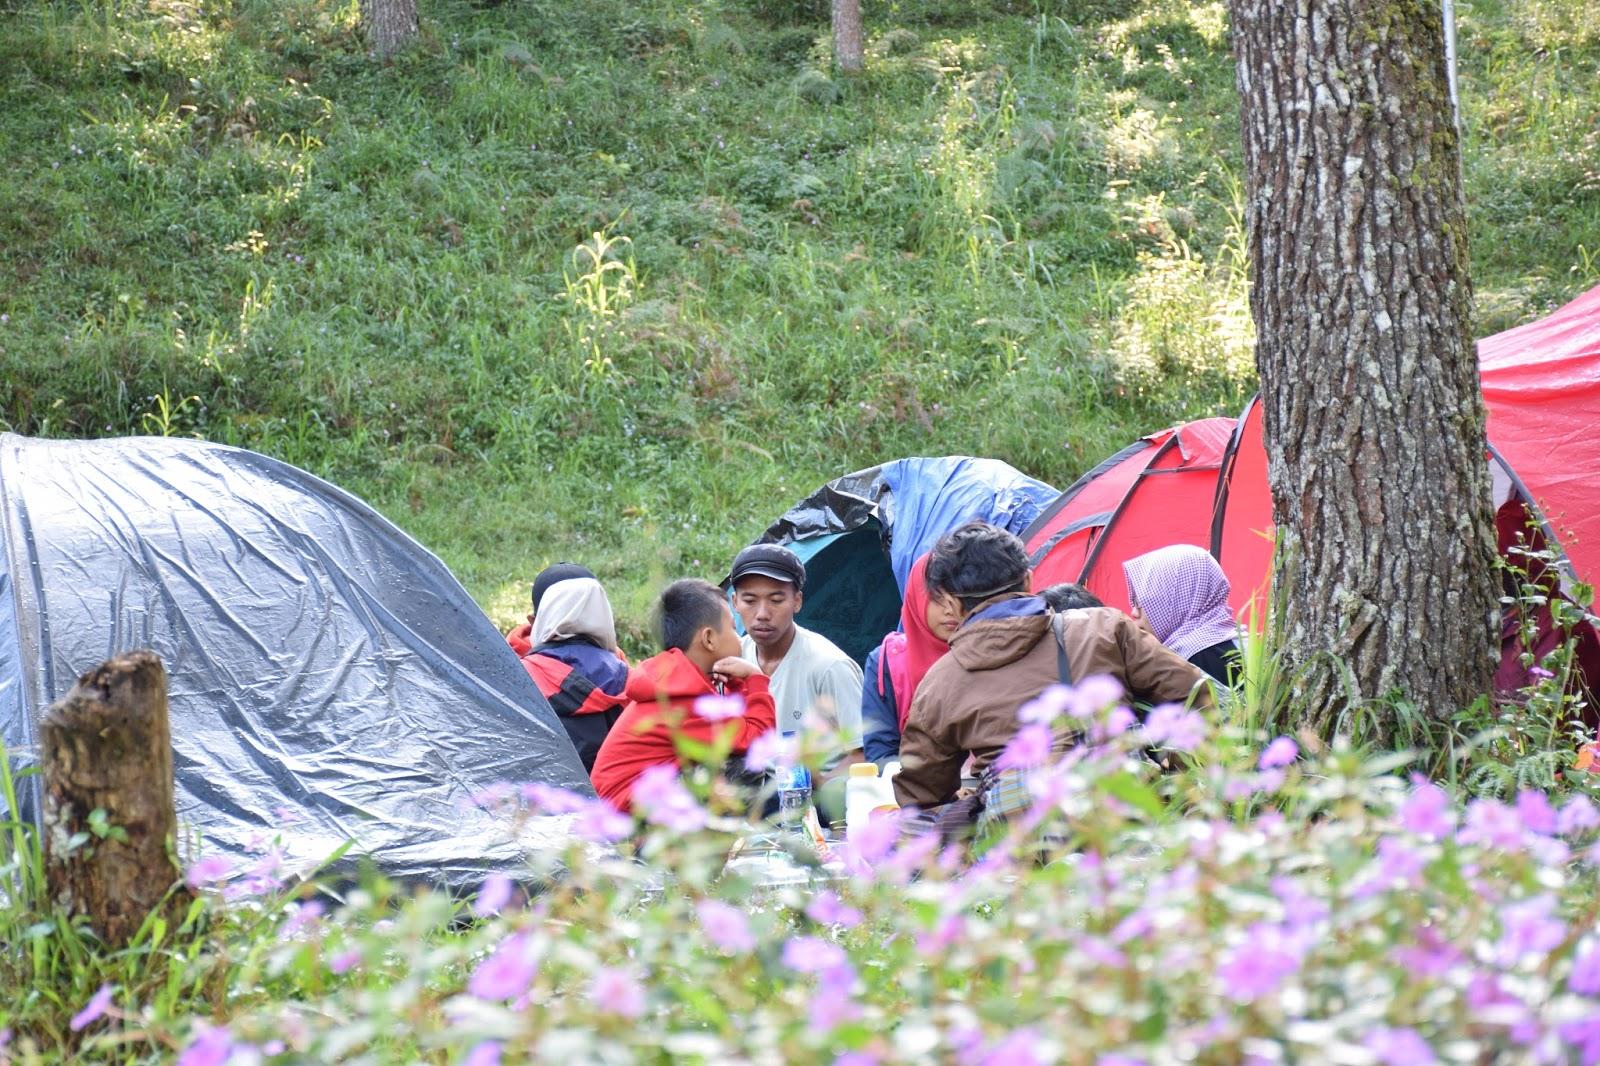 Taman Hutan Raya Tahura Wonderful Indonesia Kabupaten Karanganyar Camping Ceria